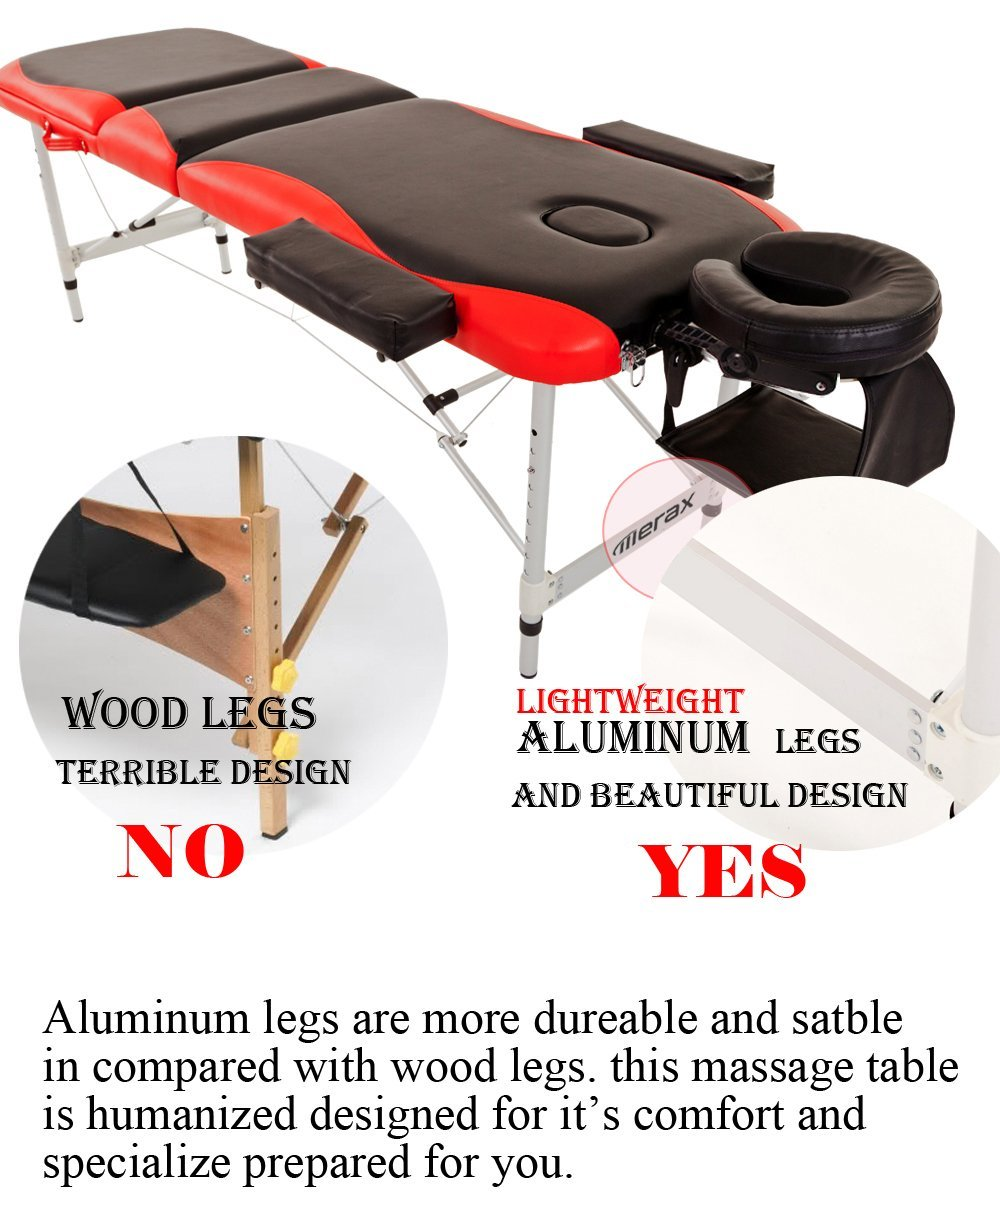 Merax WF015763JAA Aluminium 3 Section Portable Folding Massage Table Facial SPA Tattoo Bed by Merax (Image #2)